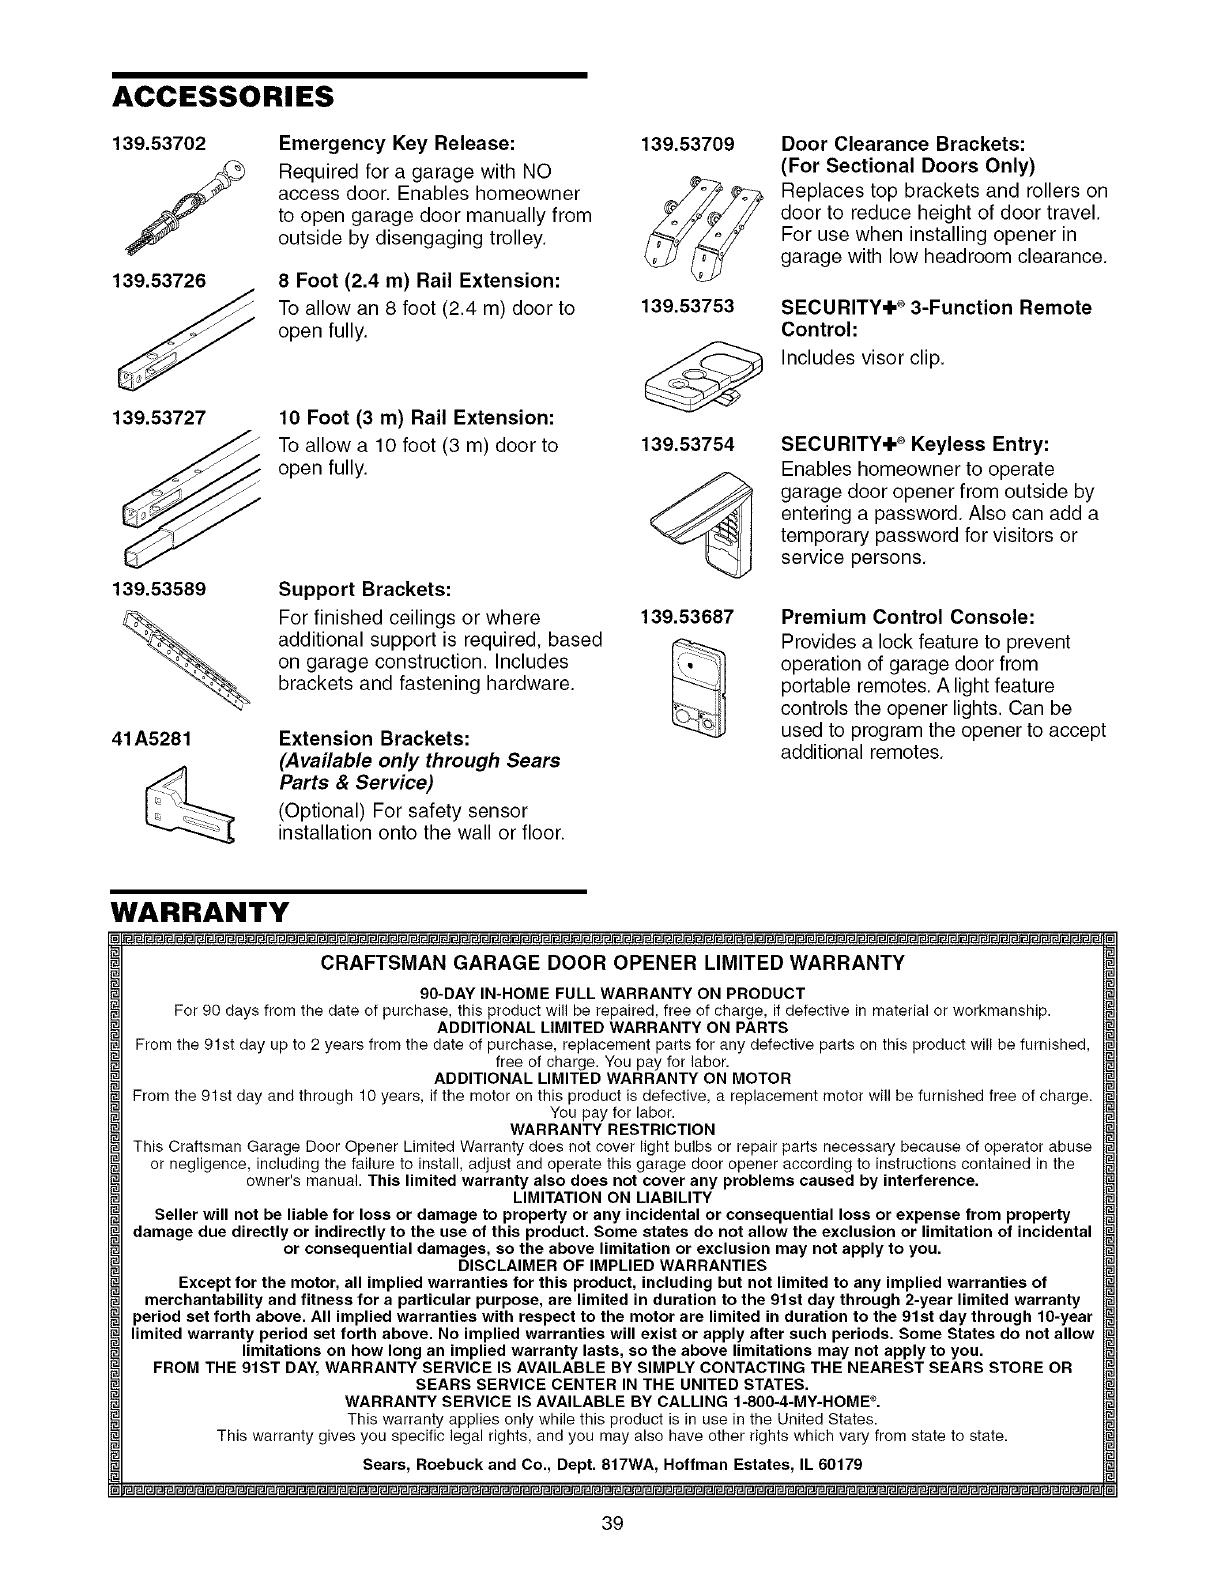 Craftsman 139 53985d Manual Enthusiast Wiring Diagrams